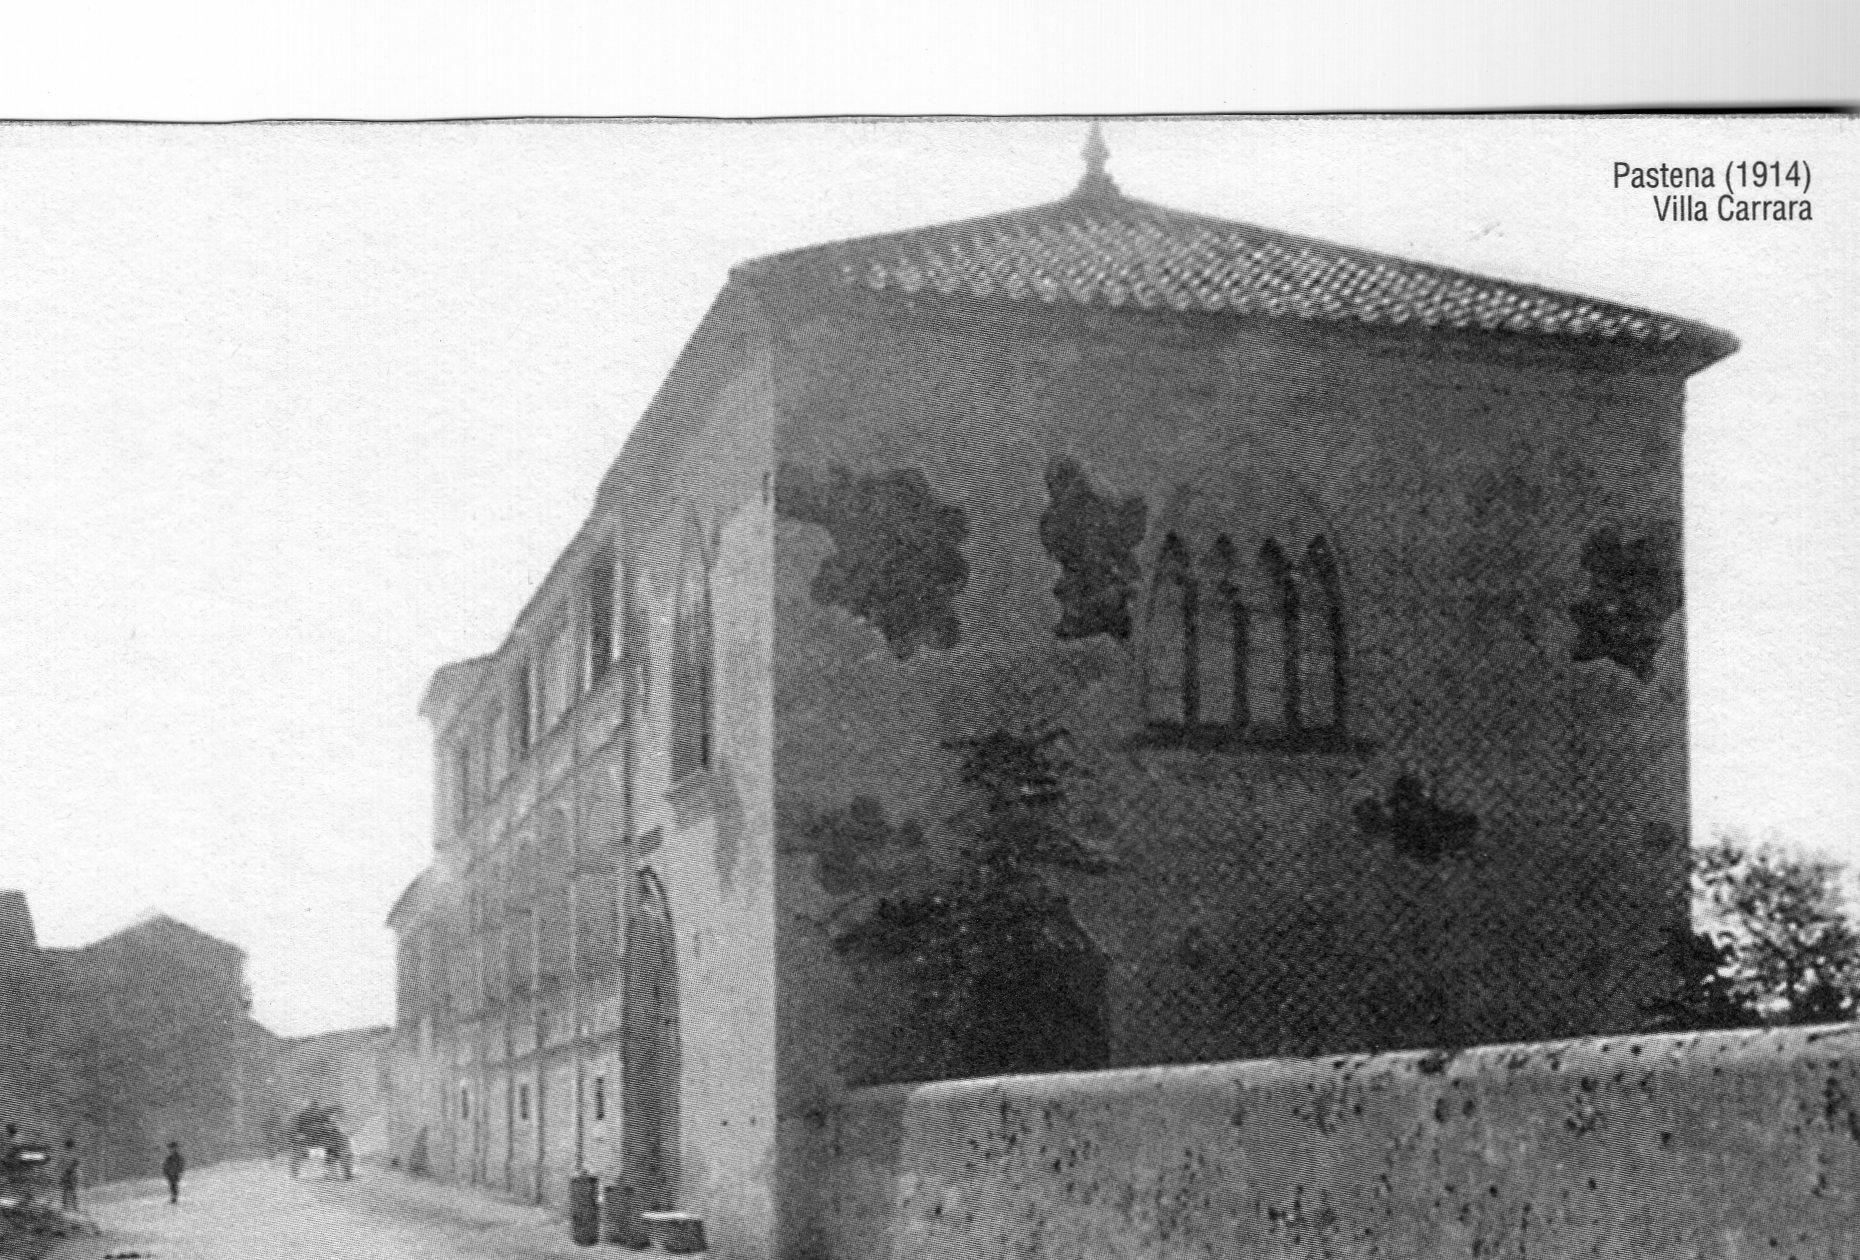 Pastena Villa Carrara (1914)